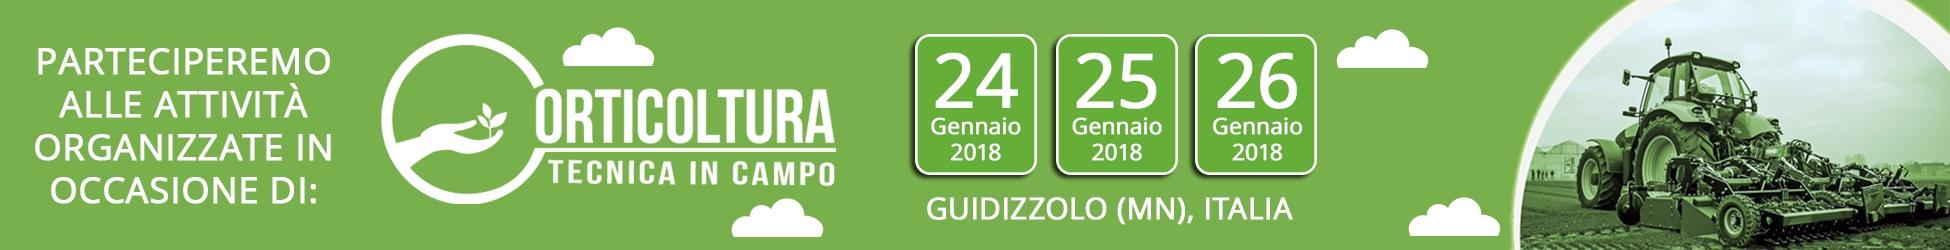 Banner-HP-ita-Orticoltura2018.jpg